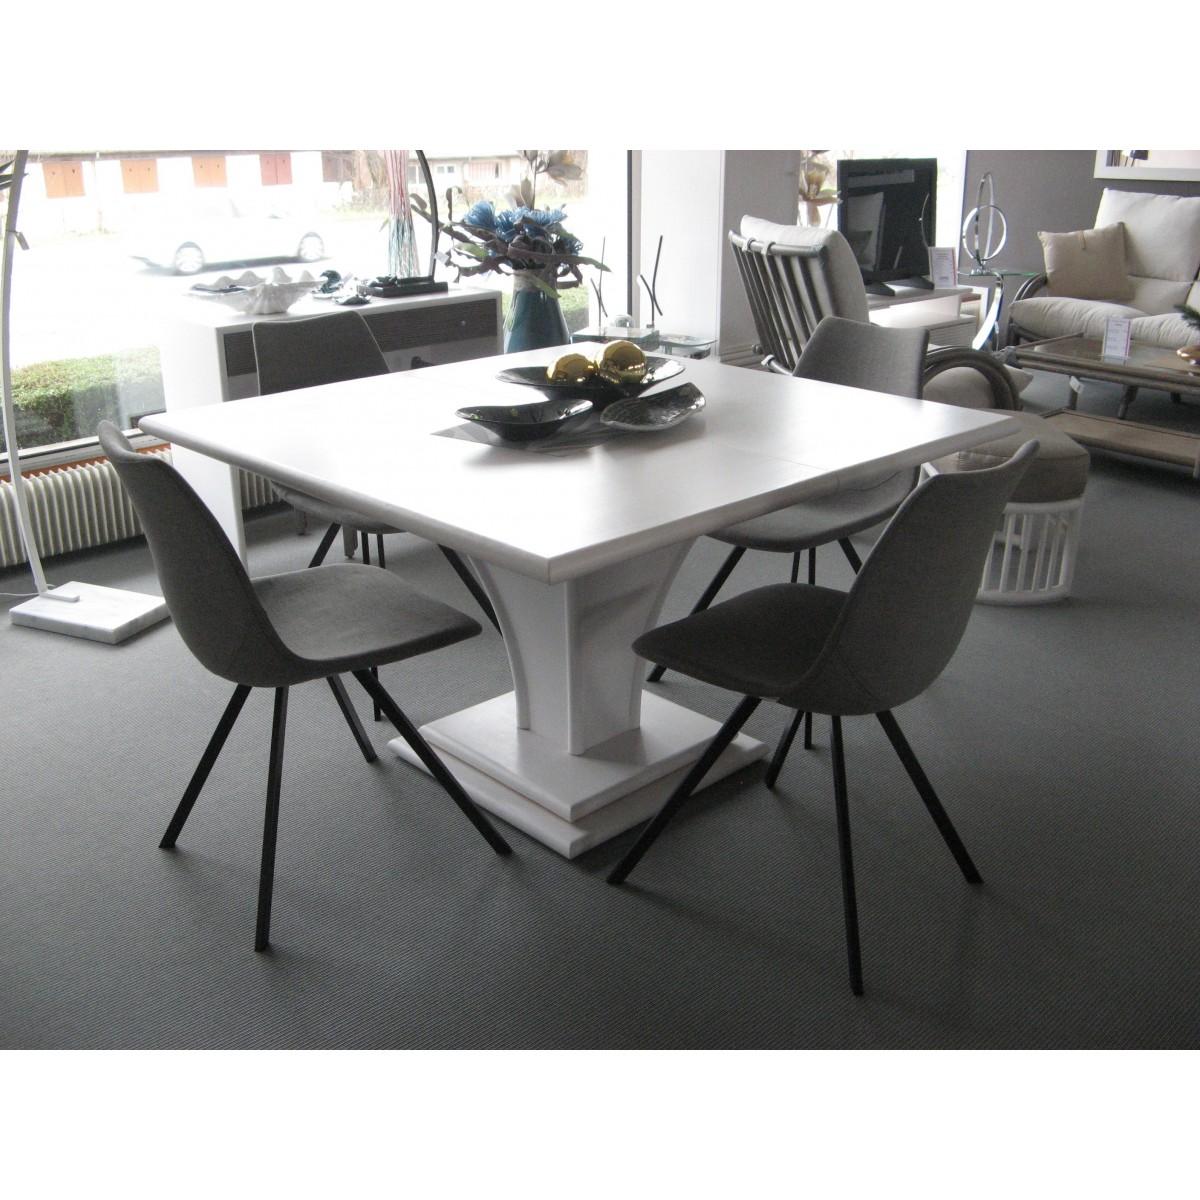 table manger en rotin carr avec allonge int gr e. Black Bedroom Furniture Sets. Home Design Ideas